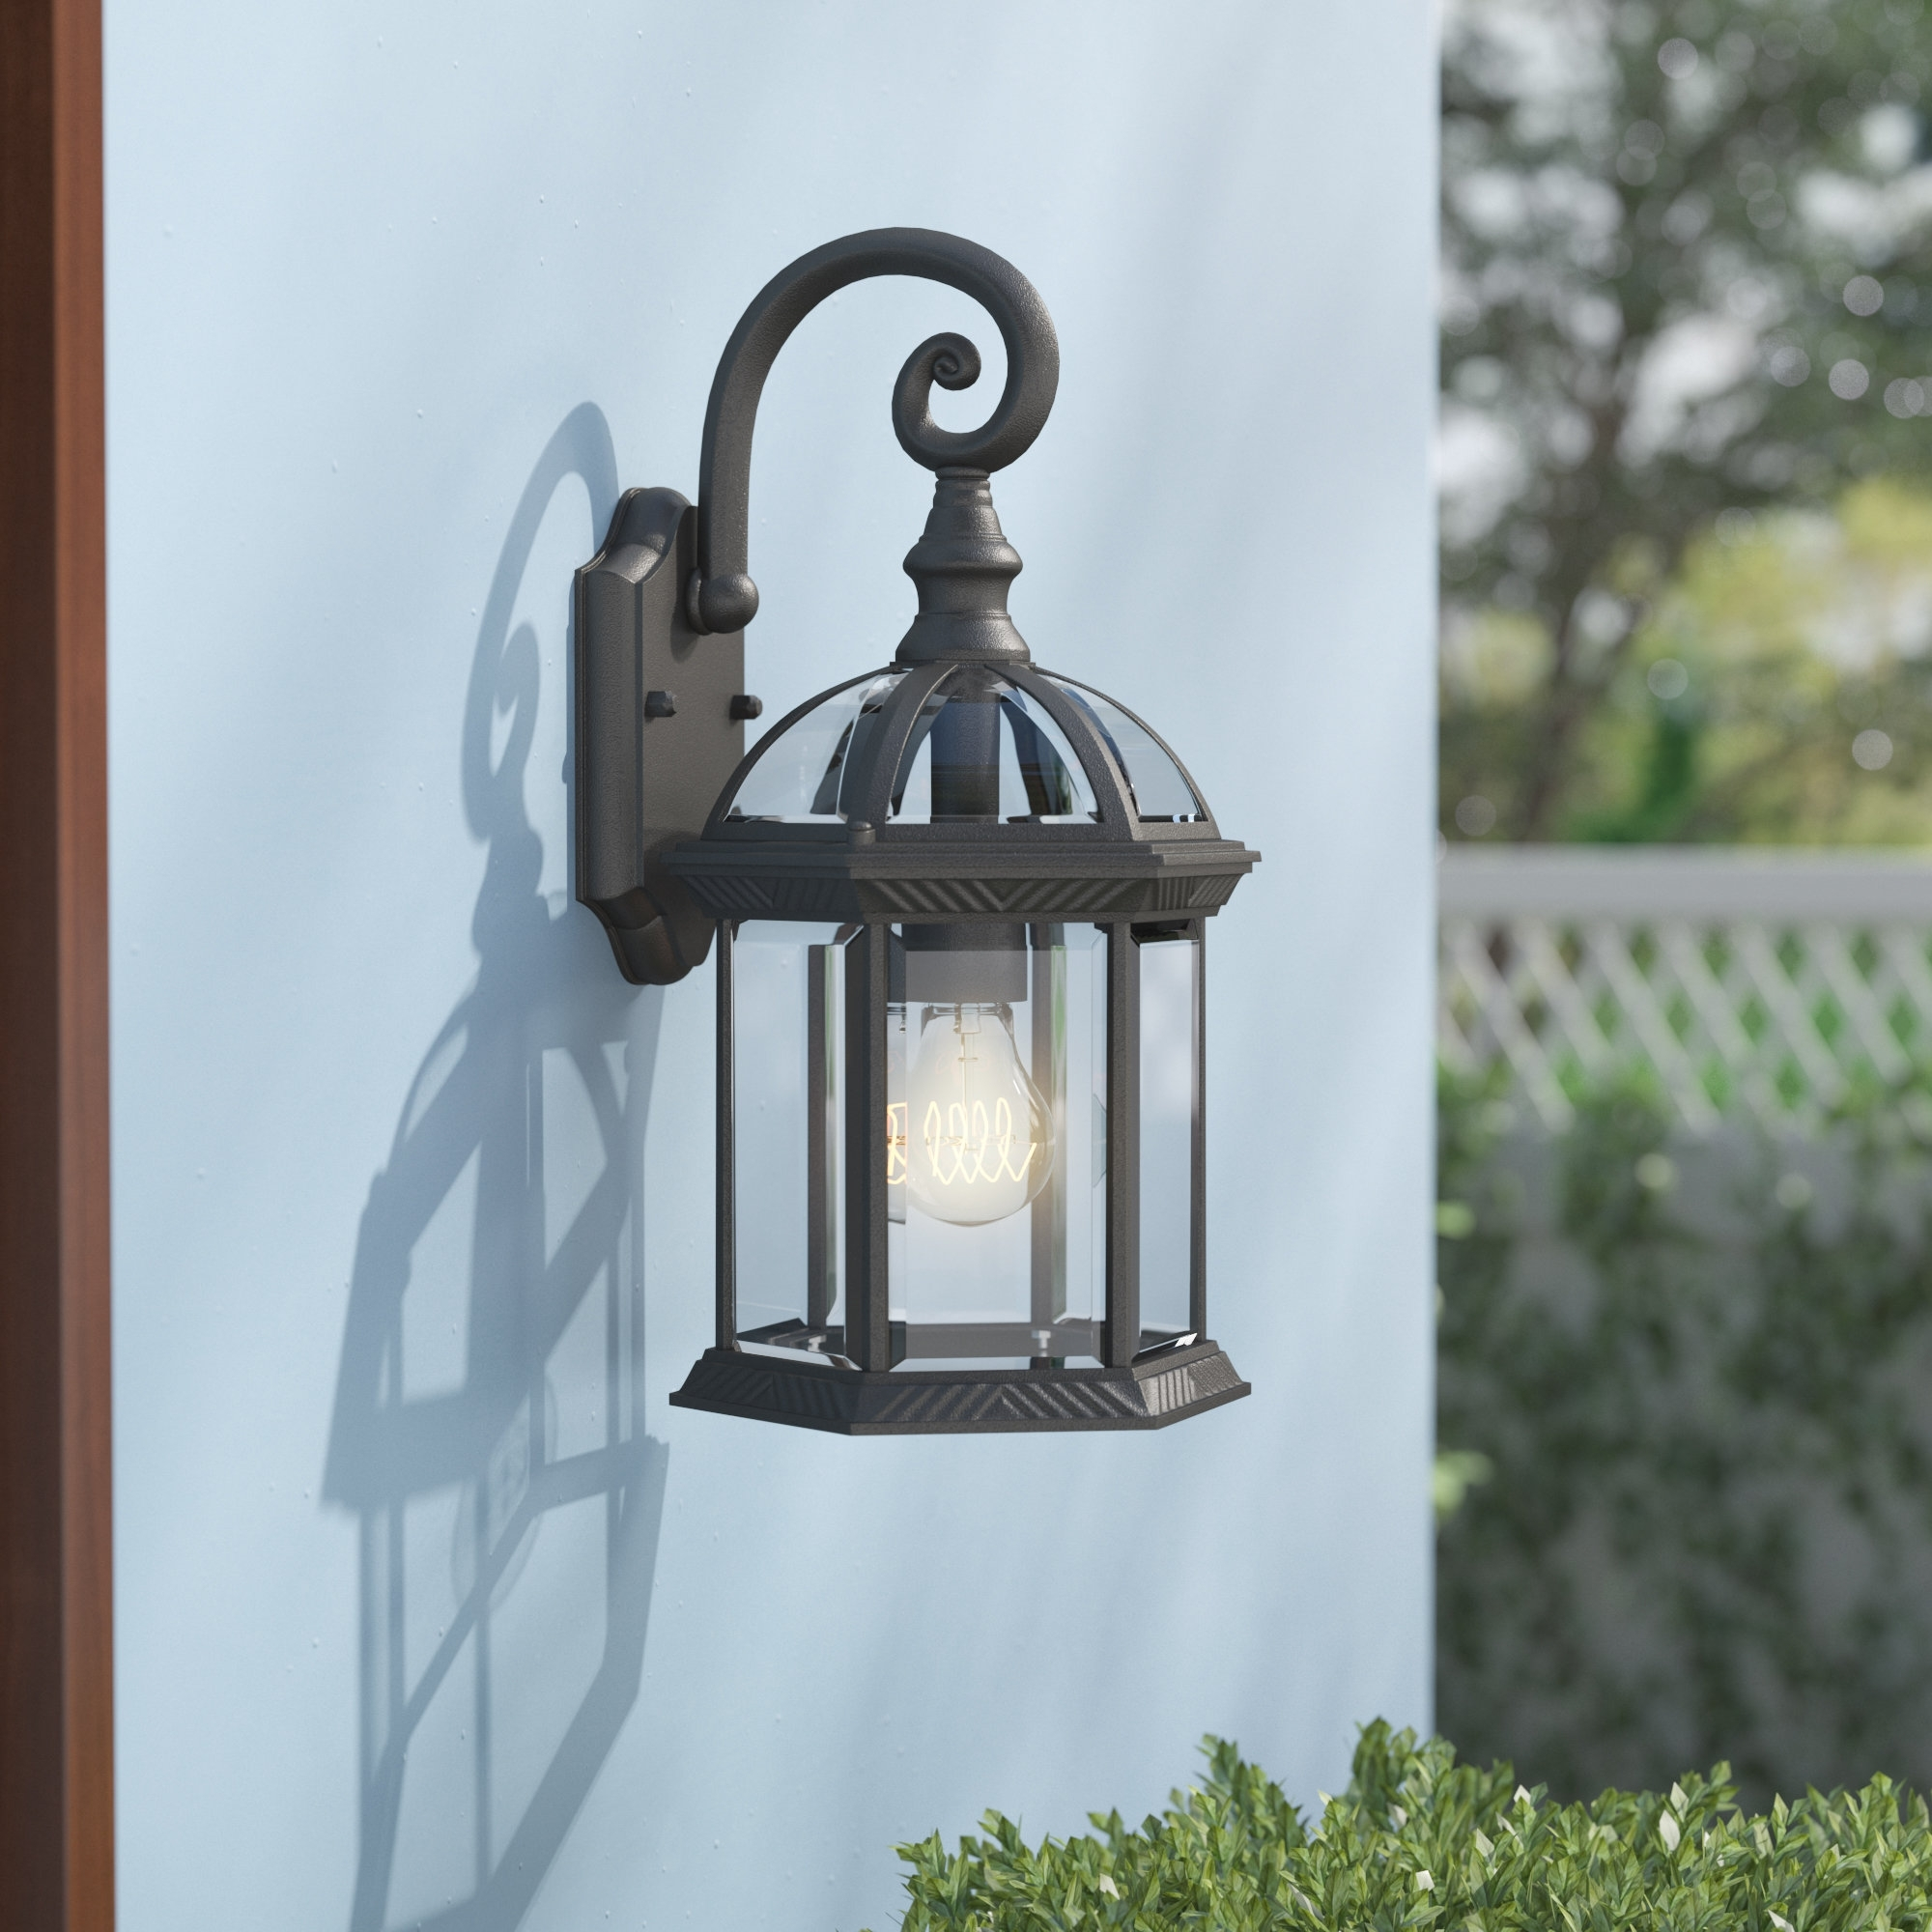 Famous Joanns Outdoor Lanterns Throughout Astoria Grand Caroline 1 Light Outdoor Wall Lantern & Reviews (View 5 of 20)